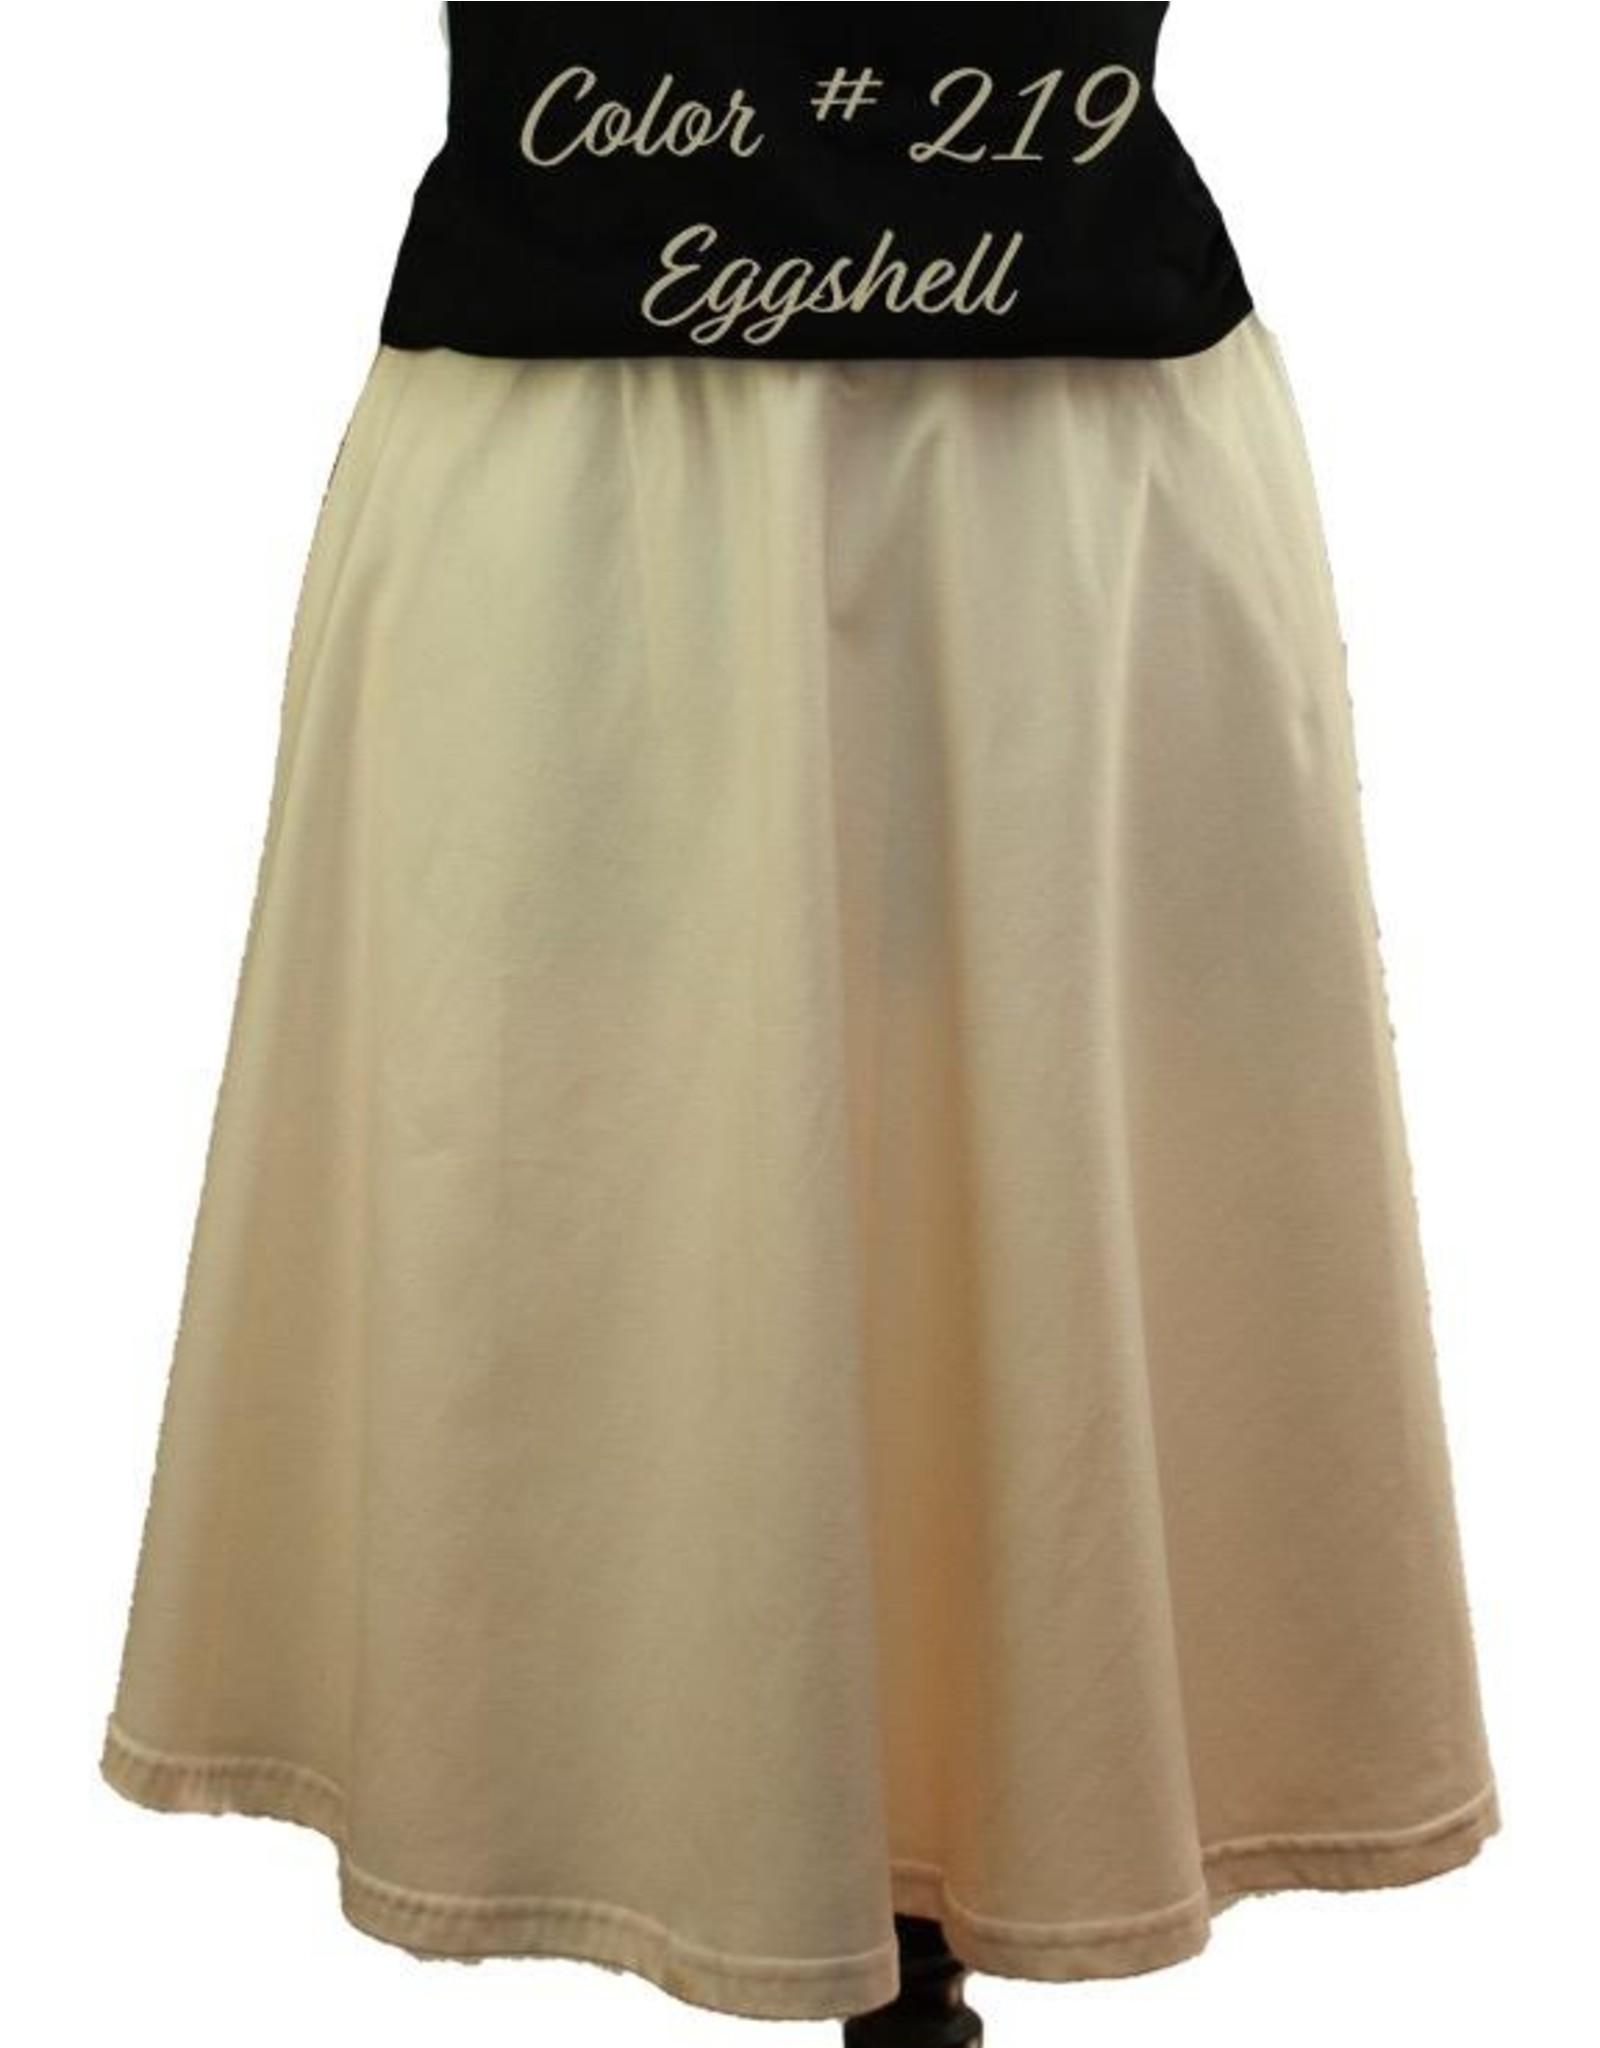 Su Placer Beth Skirt